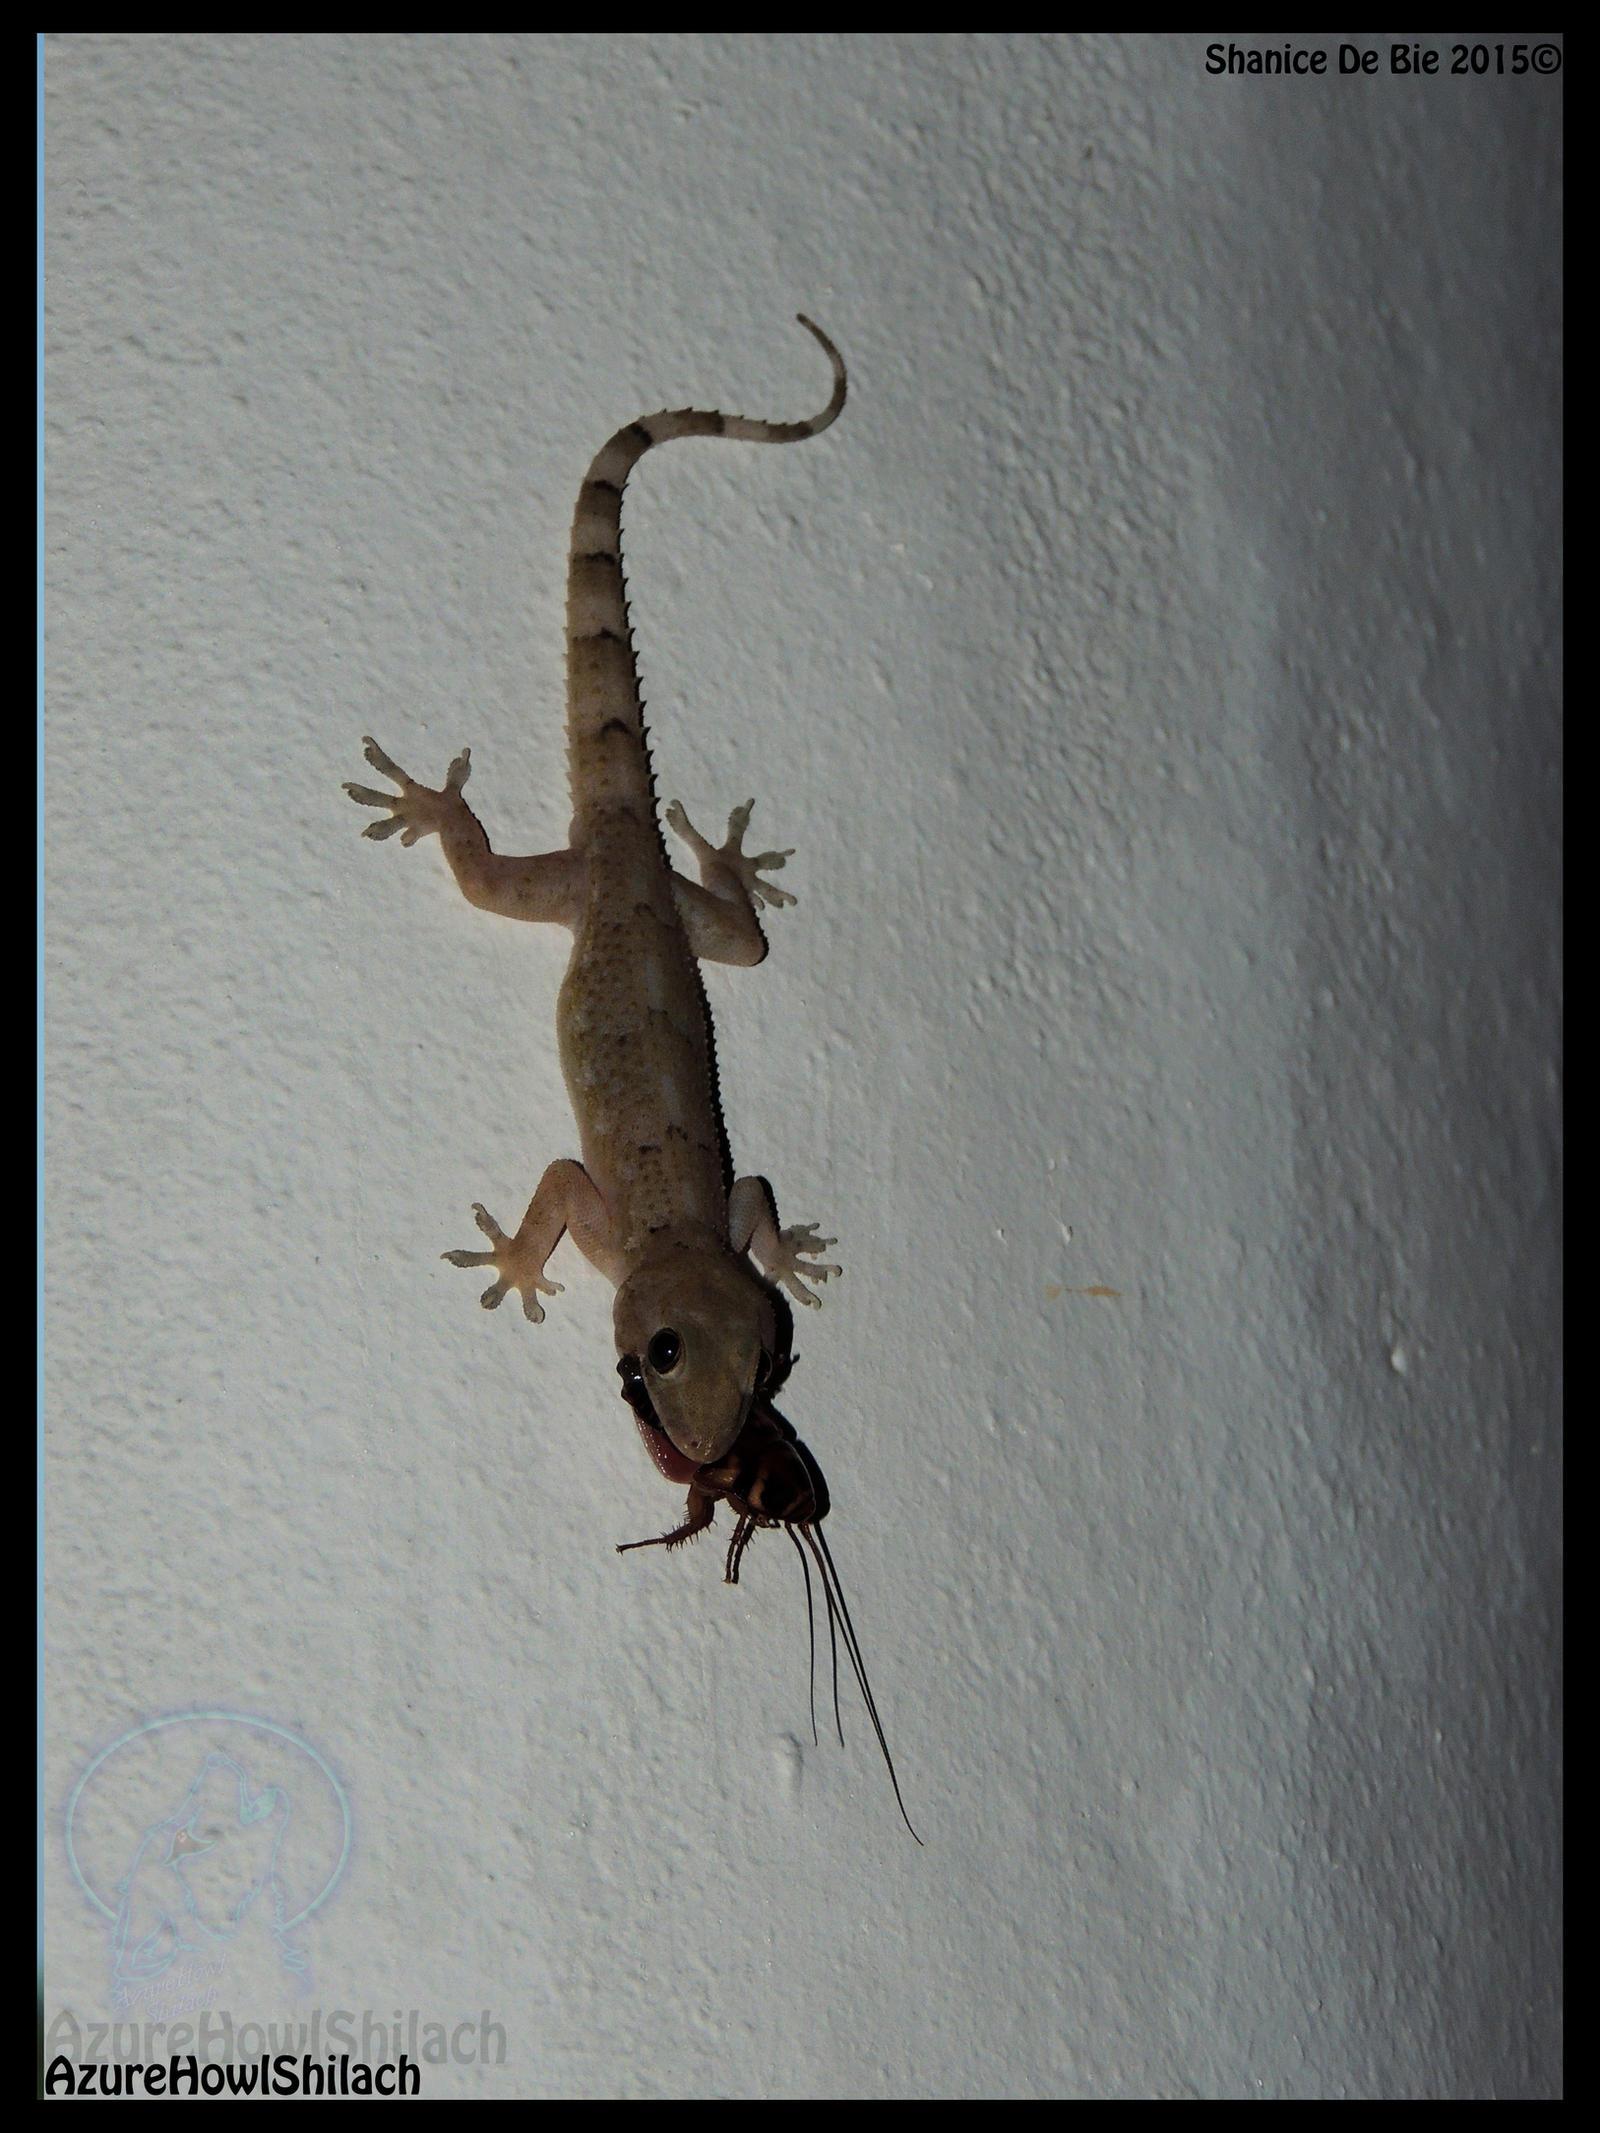 the tropical house geckoazurehowlshilach on deviantart